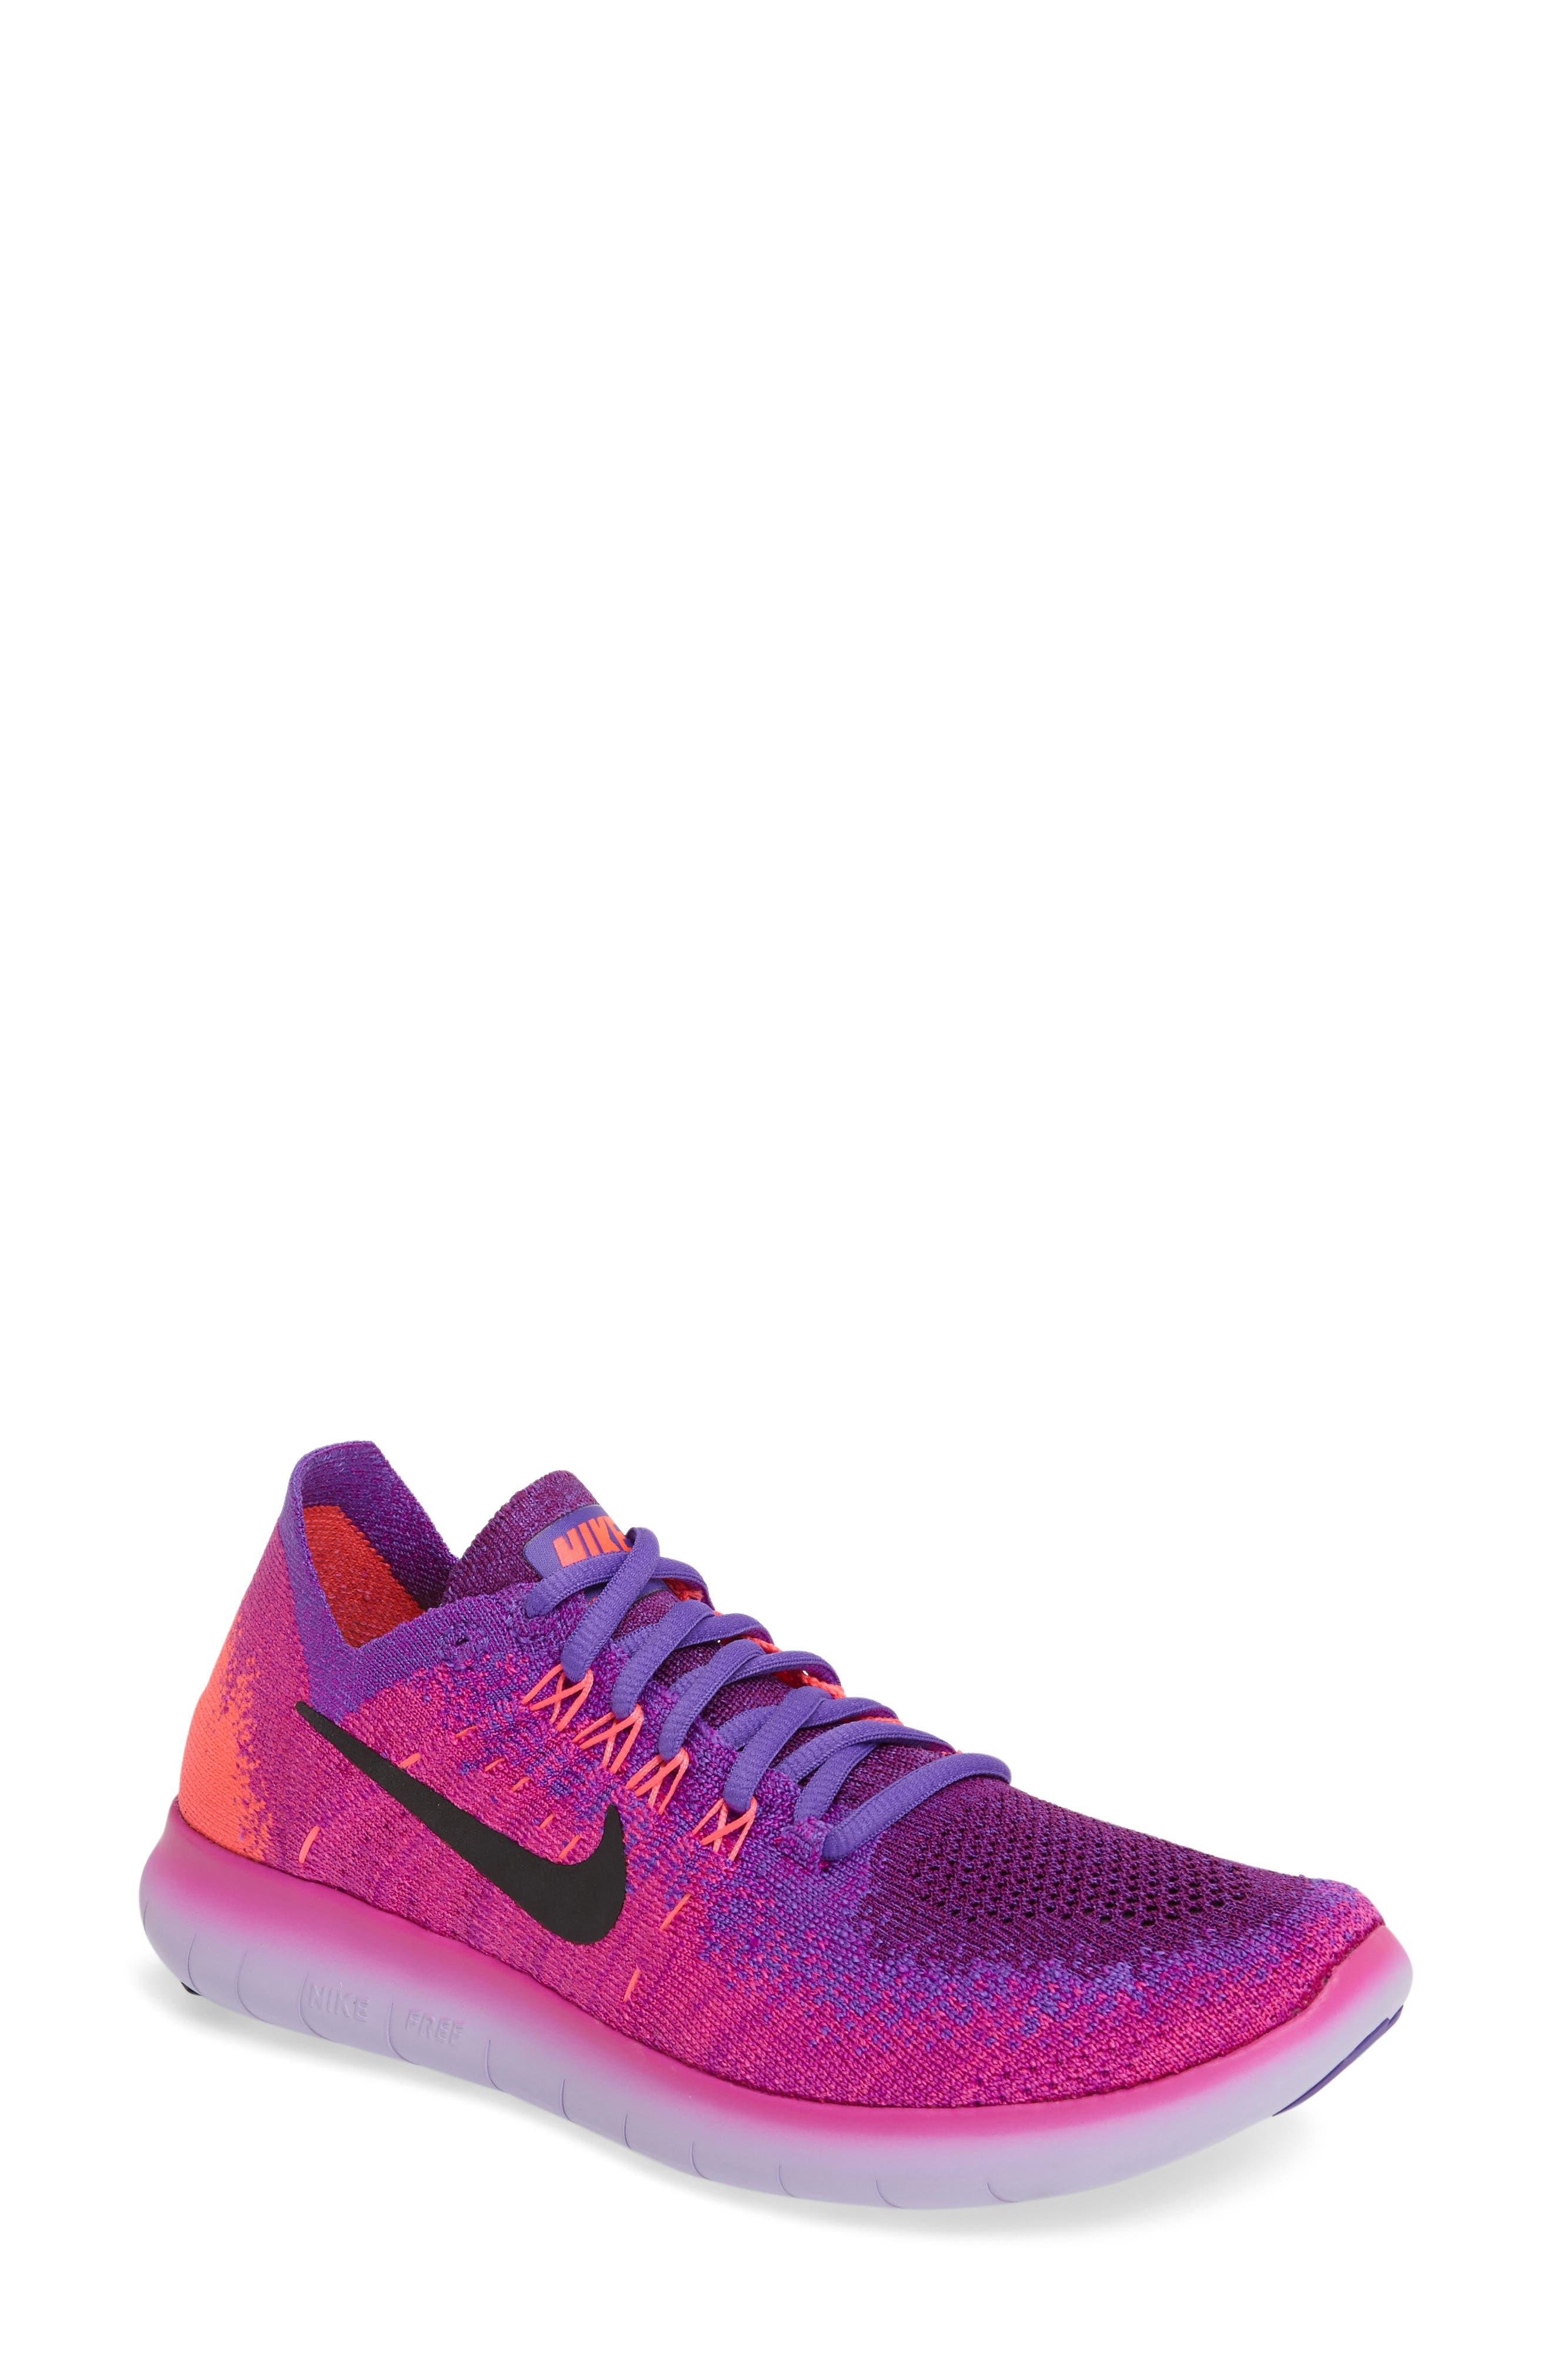 Free RN Flyknit 2 Running Shoe,                             Main thumbnail 1, color,                             Pink/ Black/ Hyper Grape